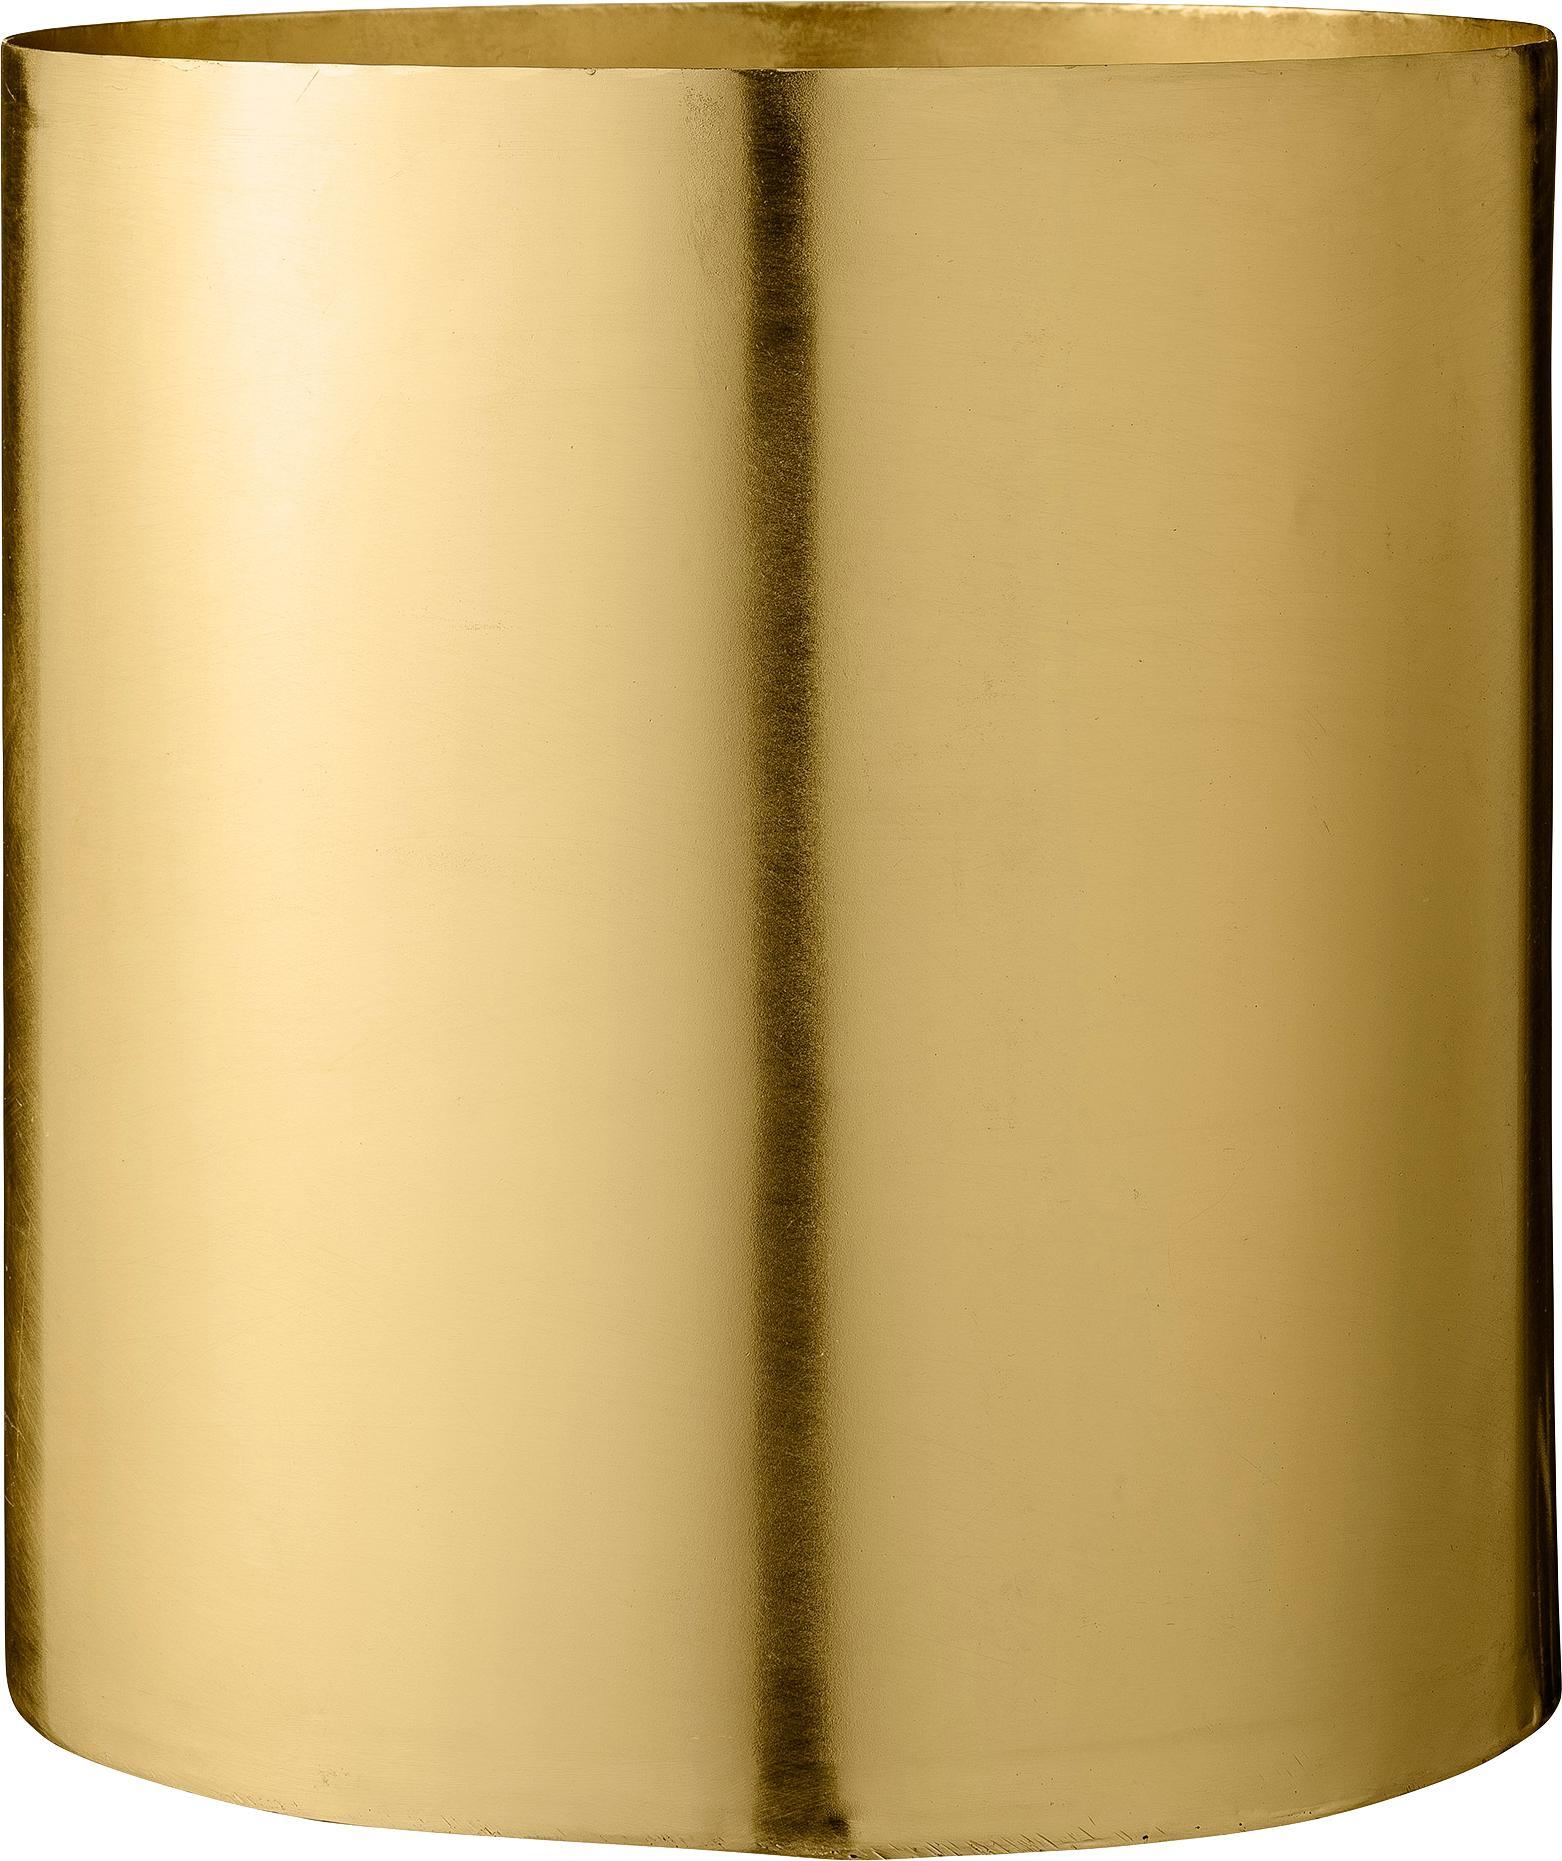 Plantenpot Sharin, Vermessingd metaal, Messingkleurig, Ø 22 x H 23 cm